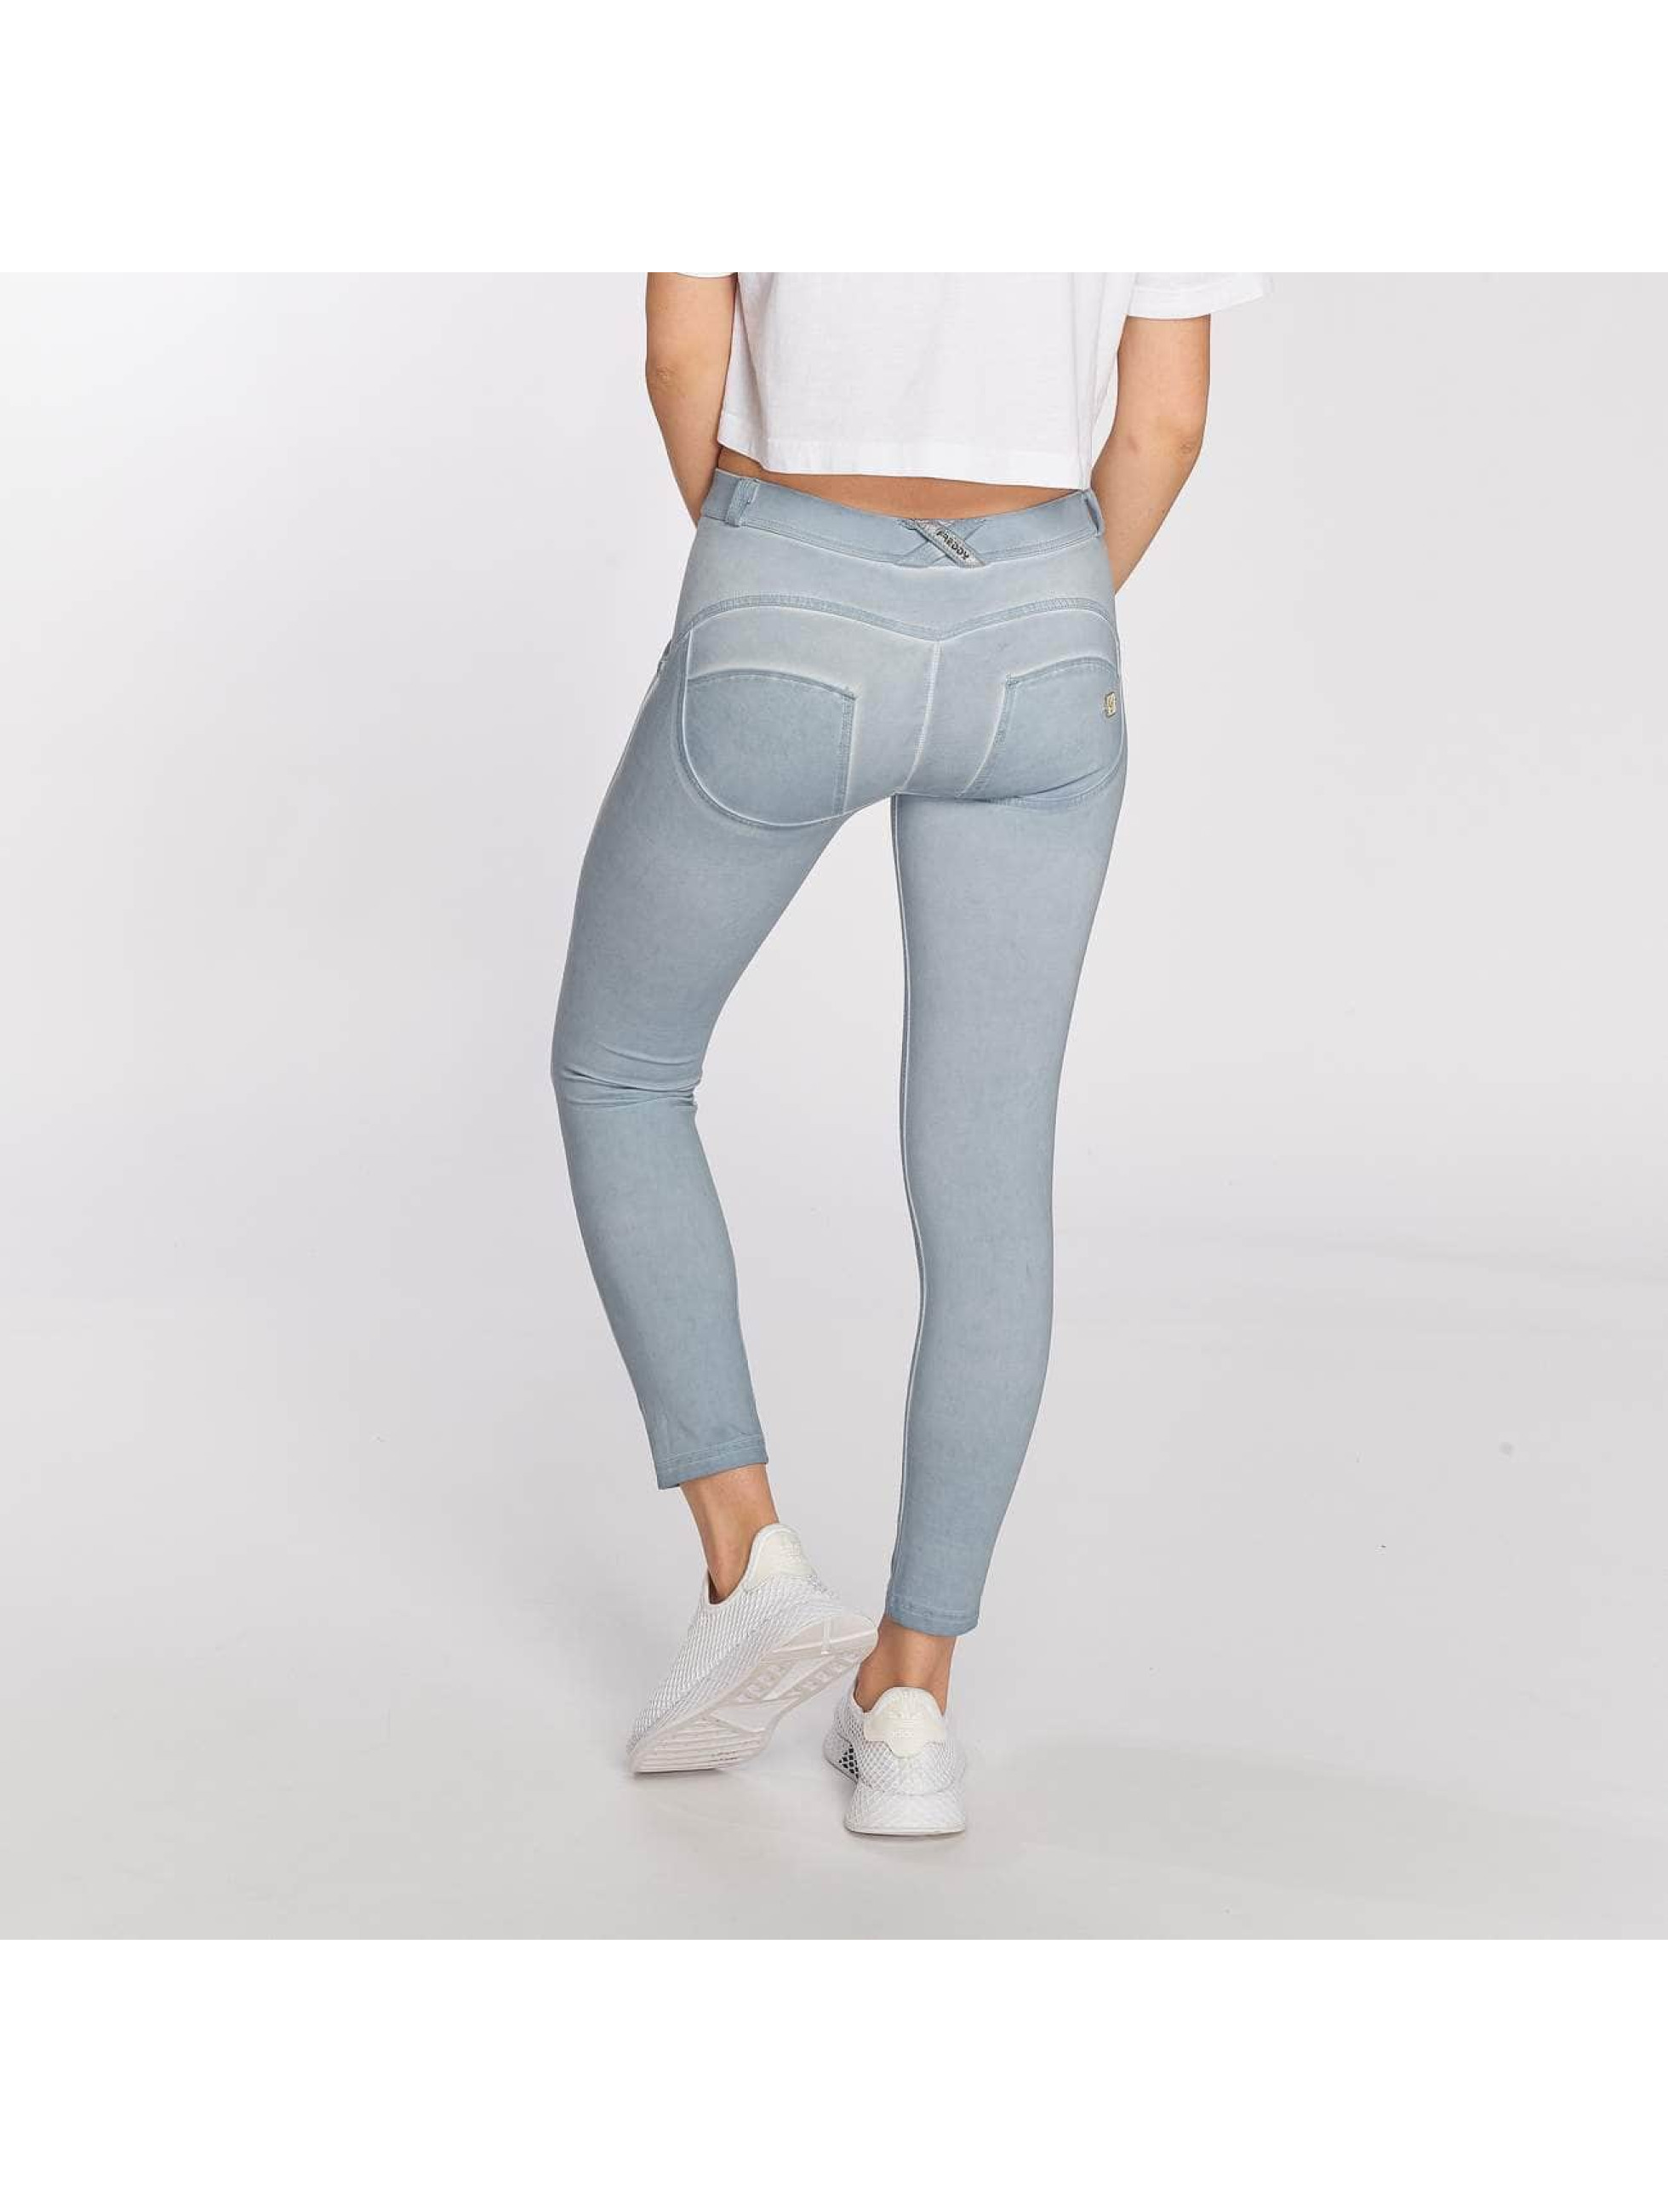 Freddy Облегающие джинсы Pantalone 7/8 синий